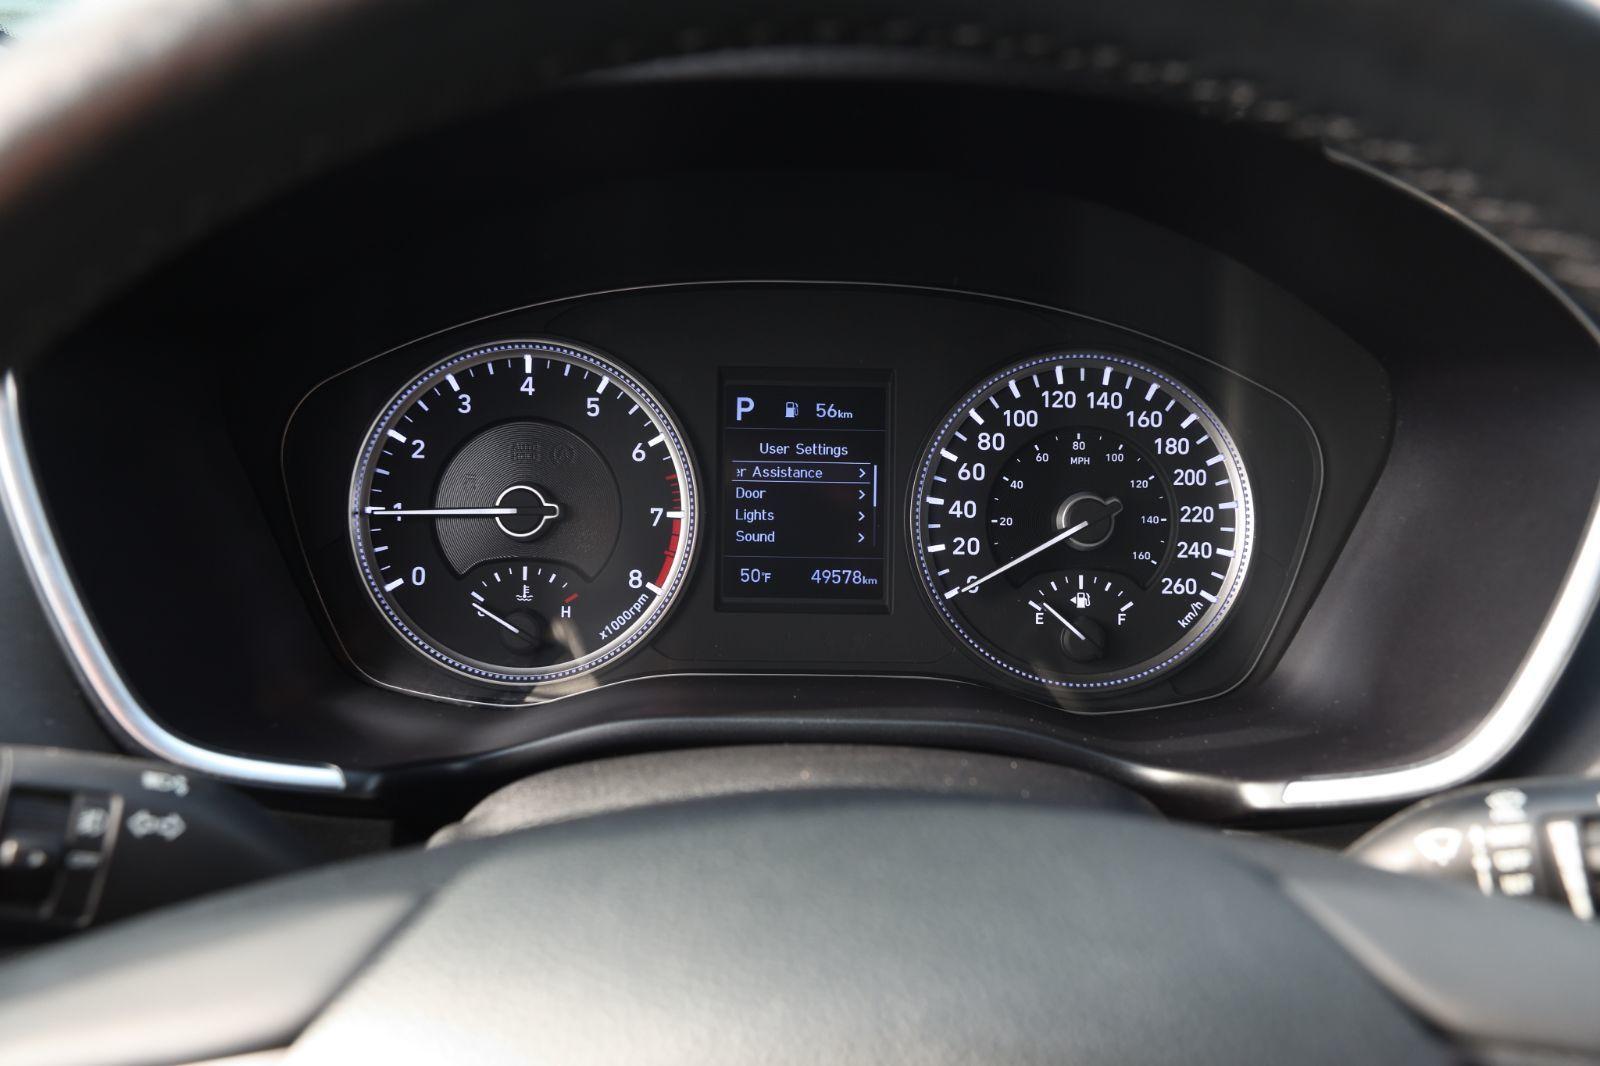 2019 Hyundai Santa Fe complet